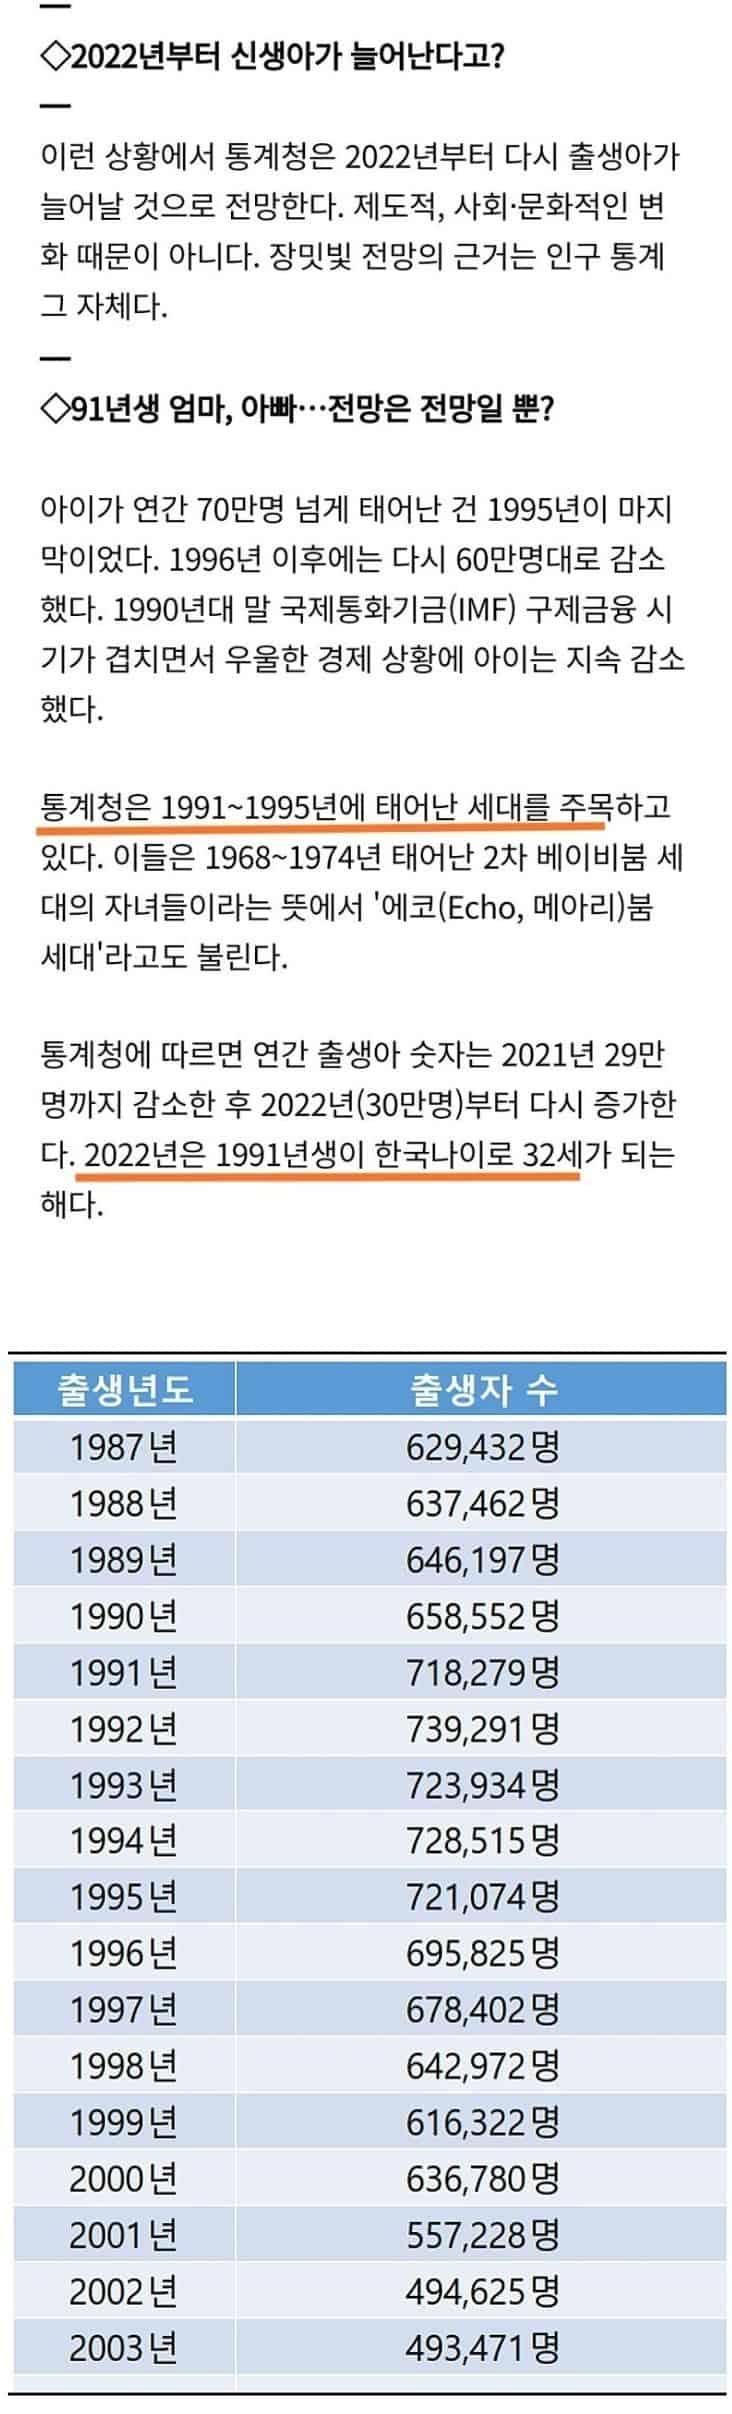 mb-file.php?path=2020%2F05%2F06%2FF119285_%ED%95%9C%EA%B5%AD%EC%9D%98%20%EB%A7%88%EC%A7%80%EB%A7%89%20%ED%9D%AC%EB%A7%9D%2091~95%EB%85%84%EC%83%9D%EB%93%A4.jpg